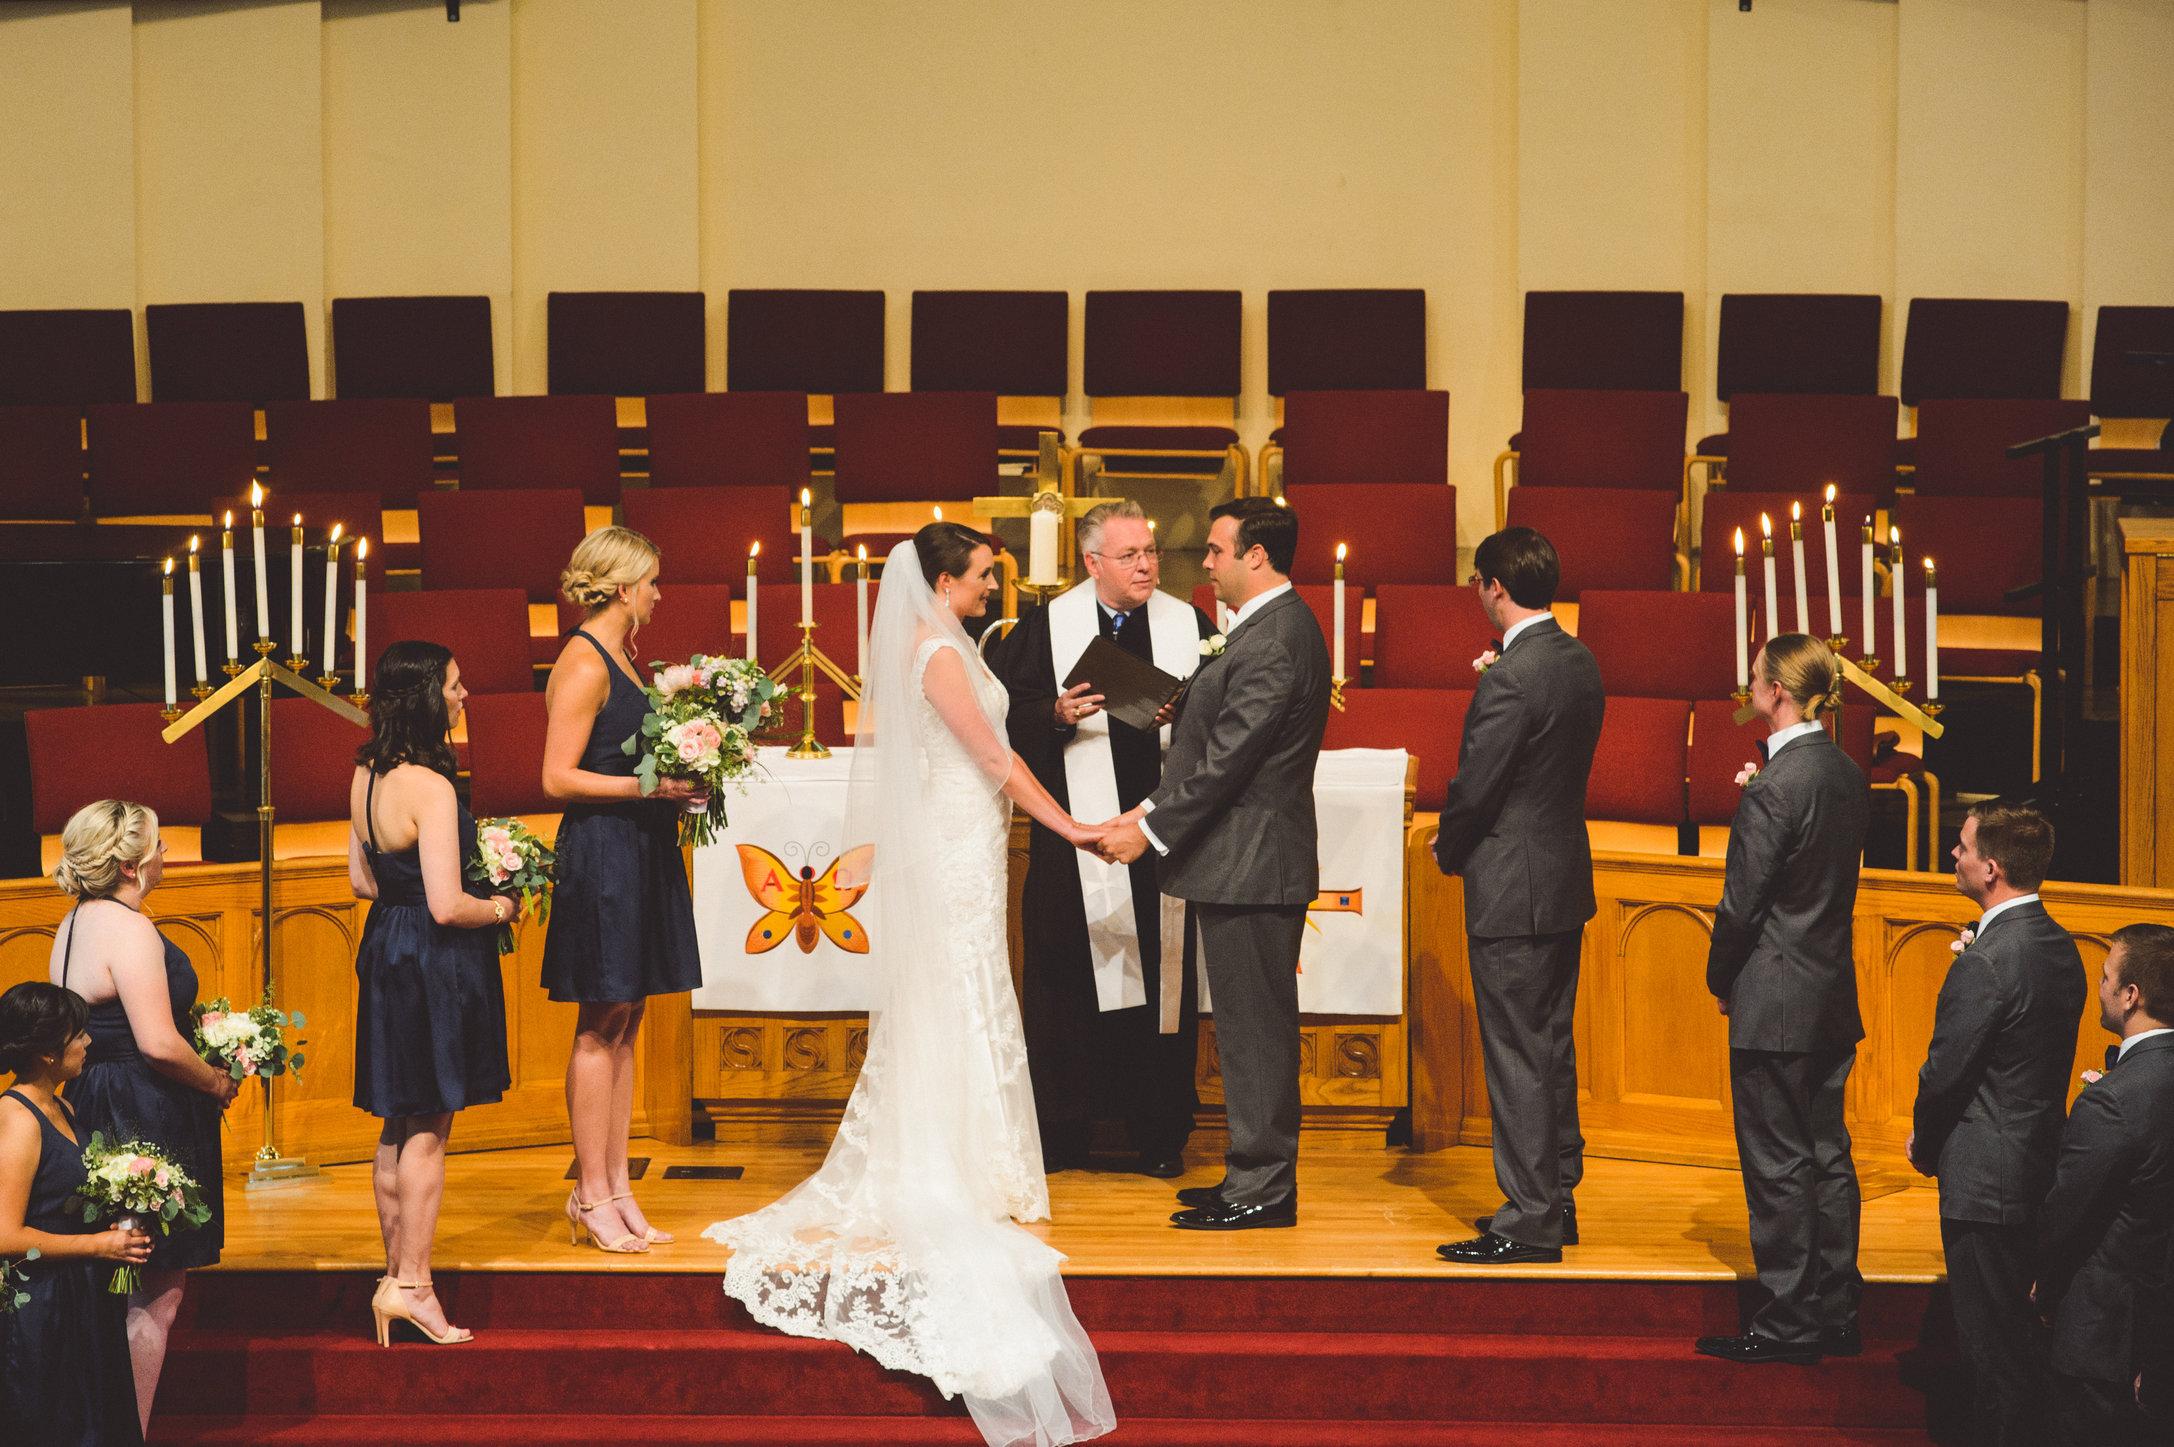 SandC-wedding-182.jpg